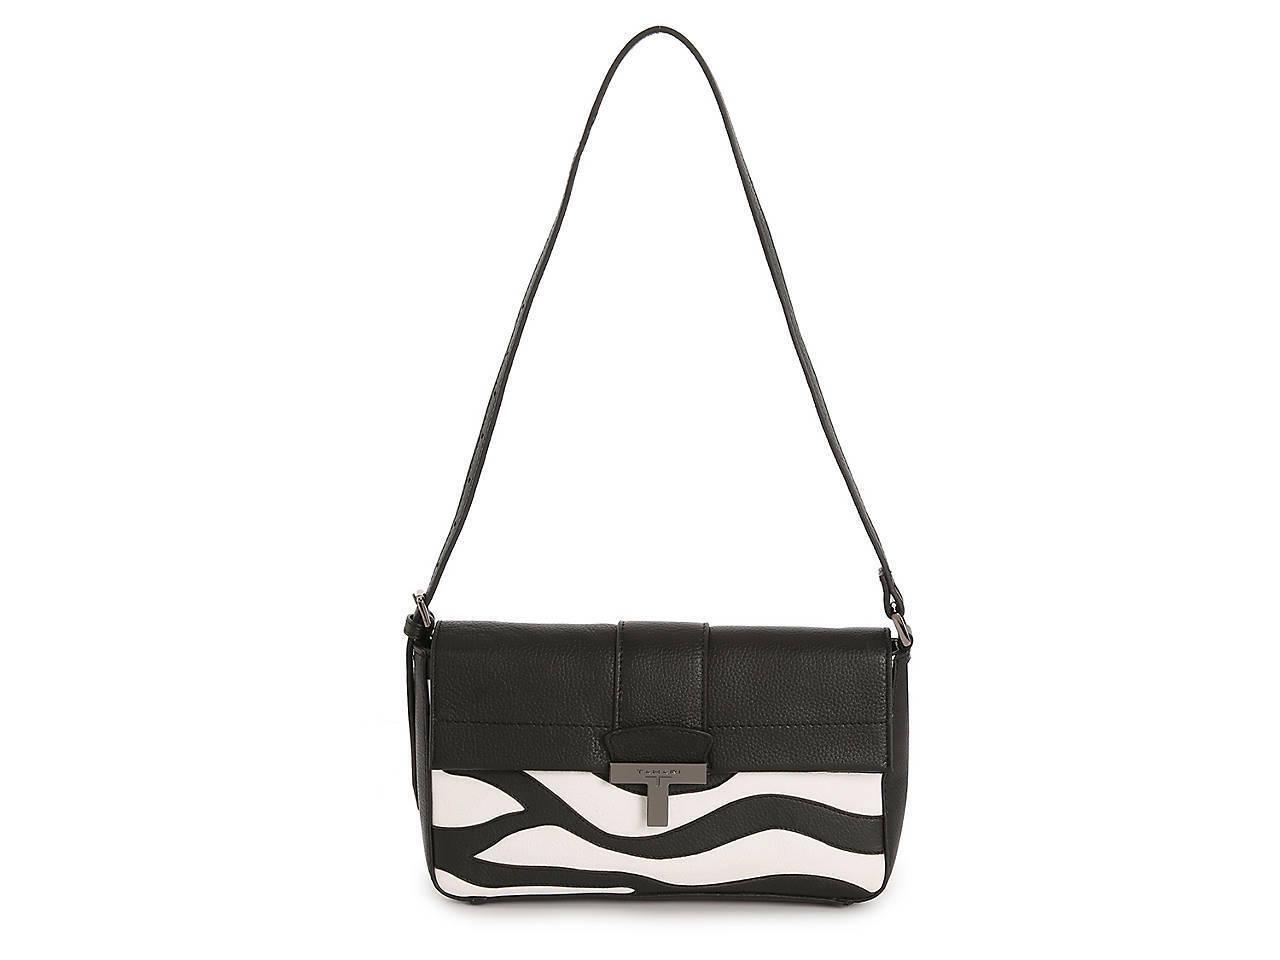 Tahari Leather Shoulder Bag Black/White Zebra Print New with Tags #PW448